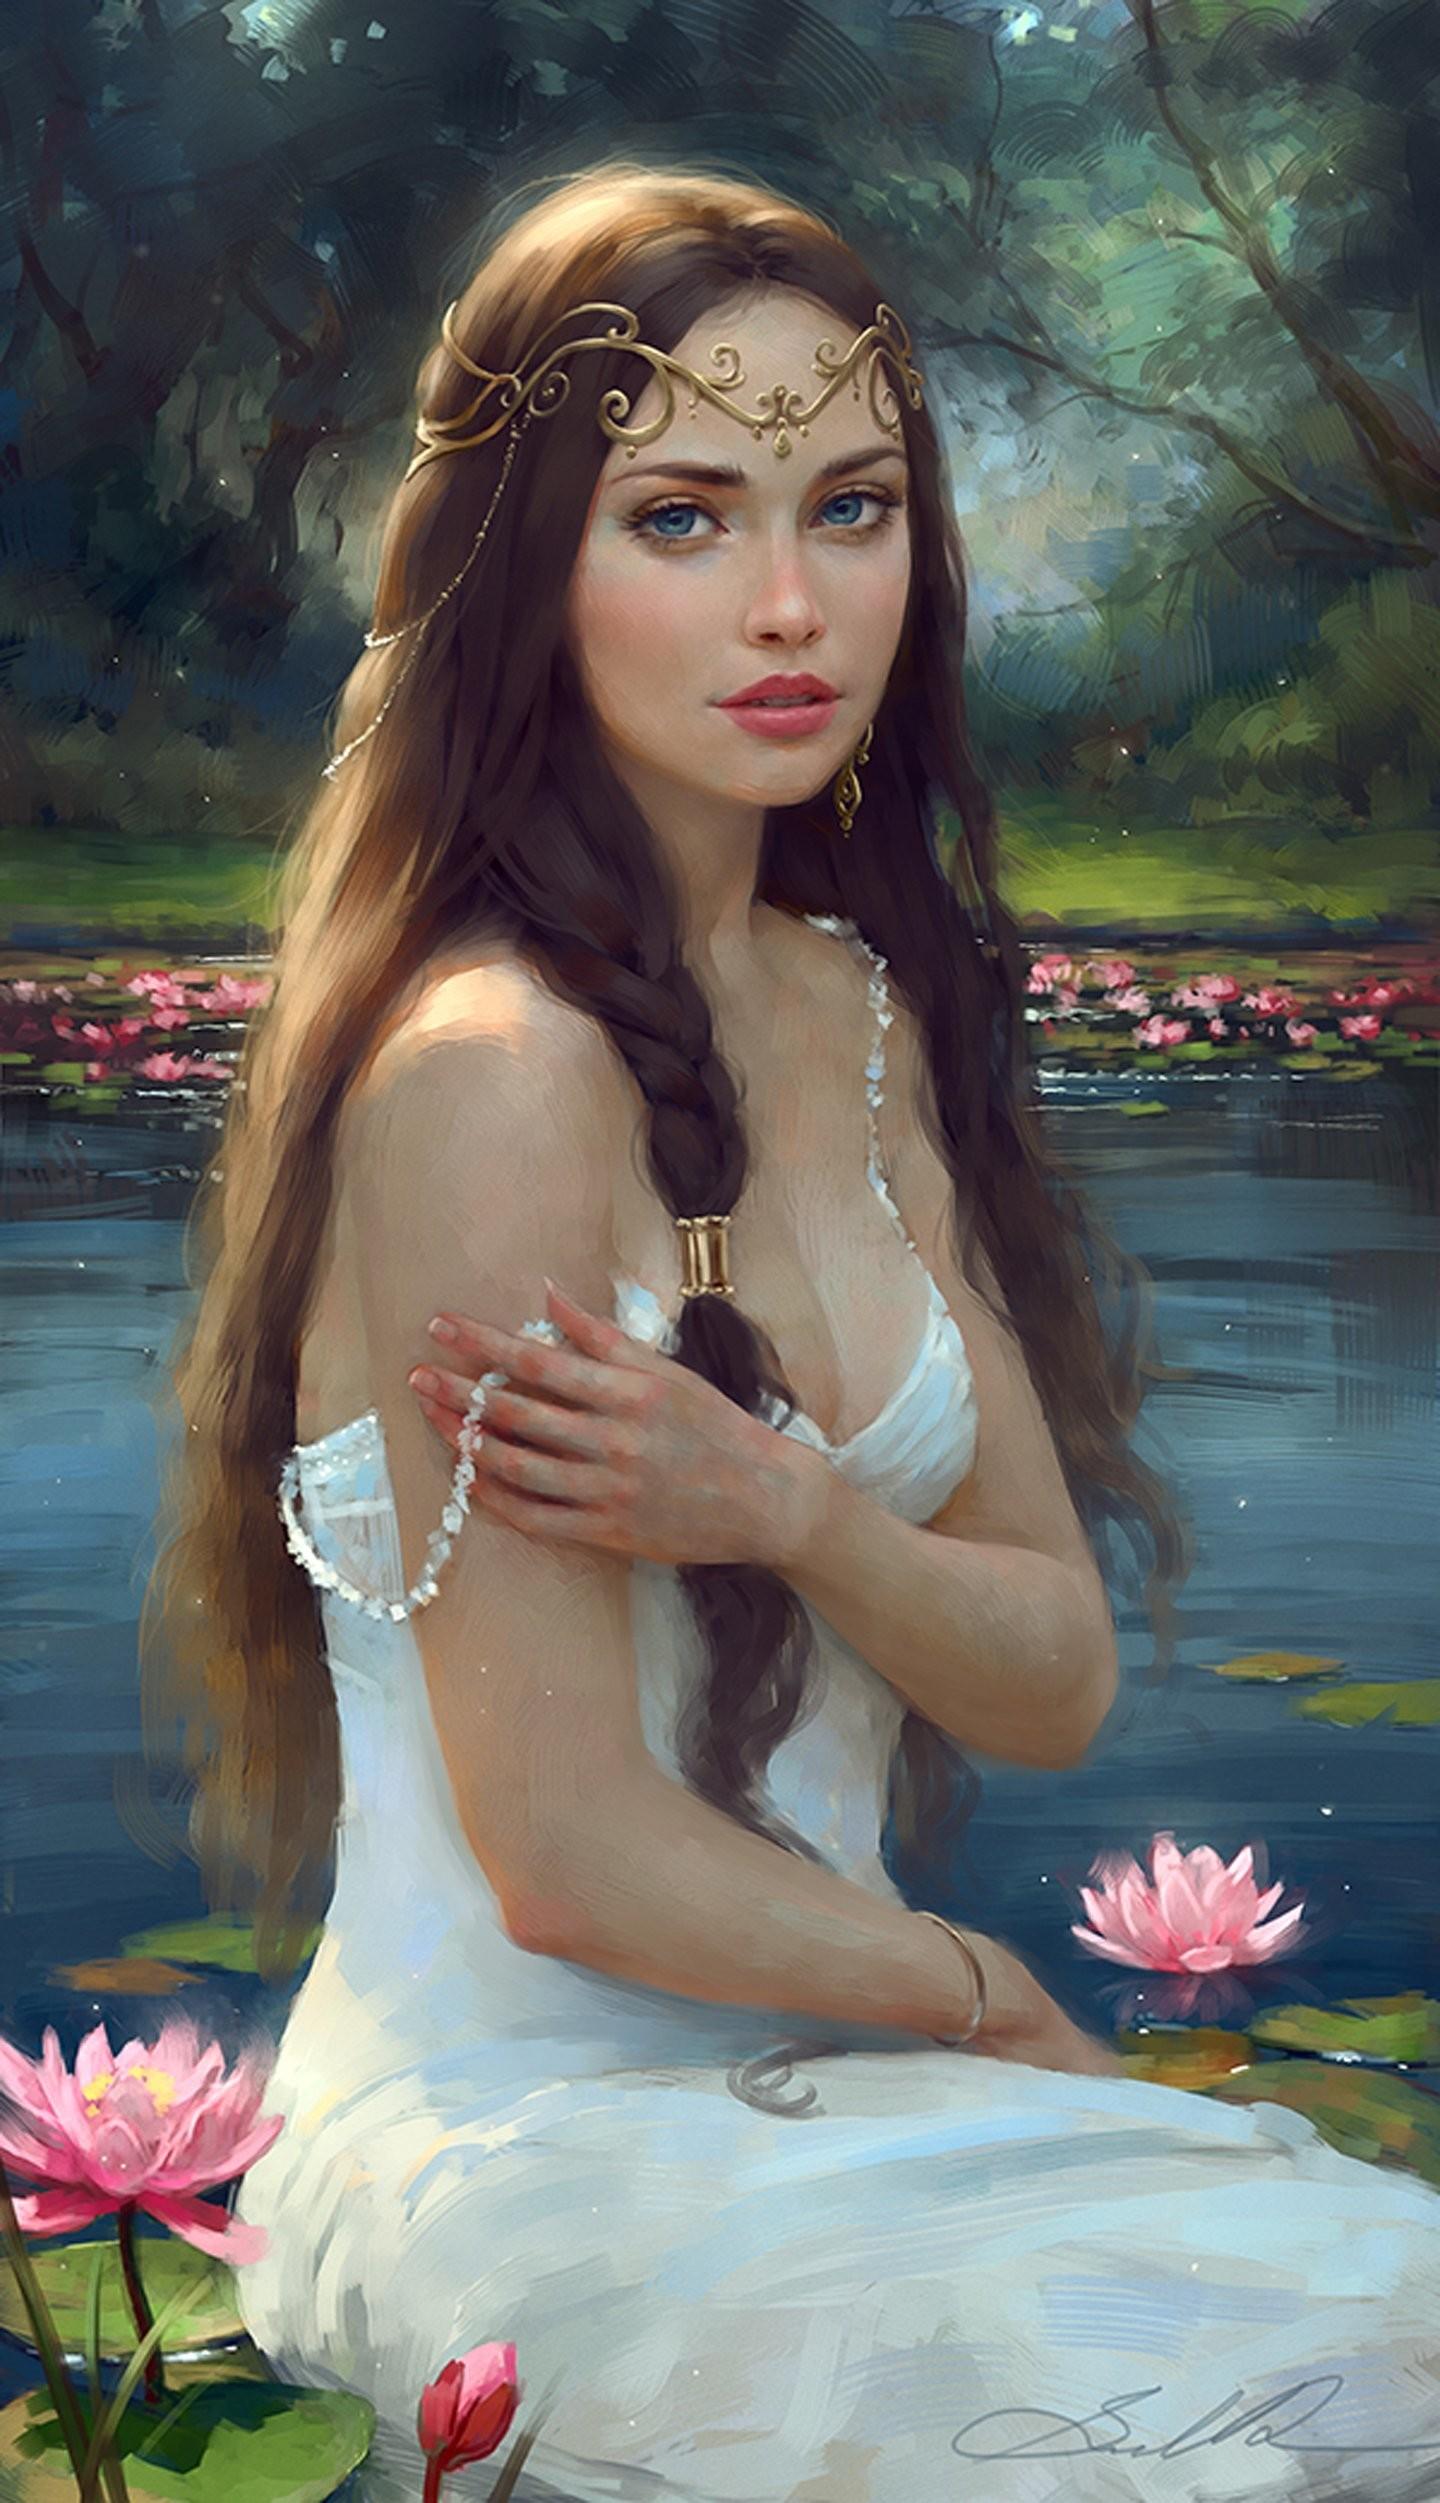 Fantasy Princess Wallpaper (78+ Images